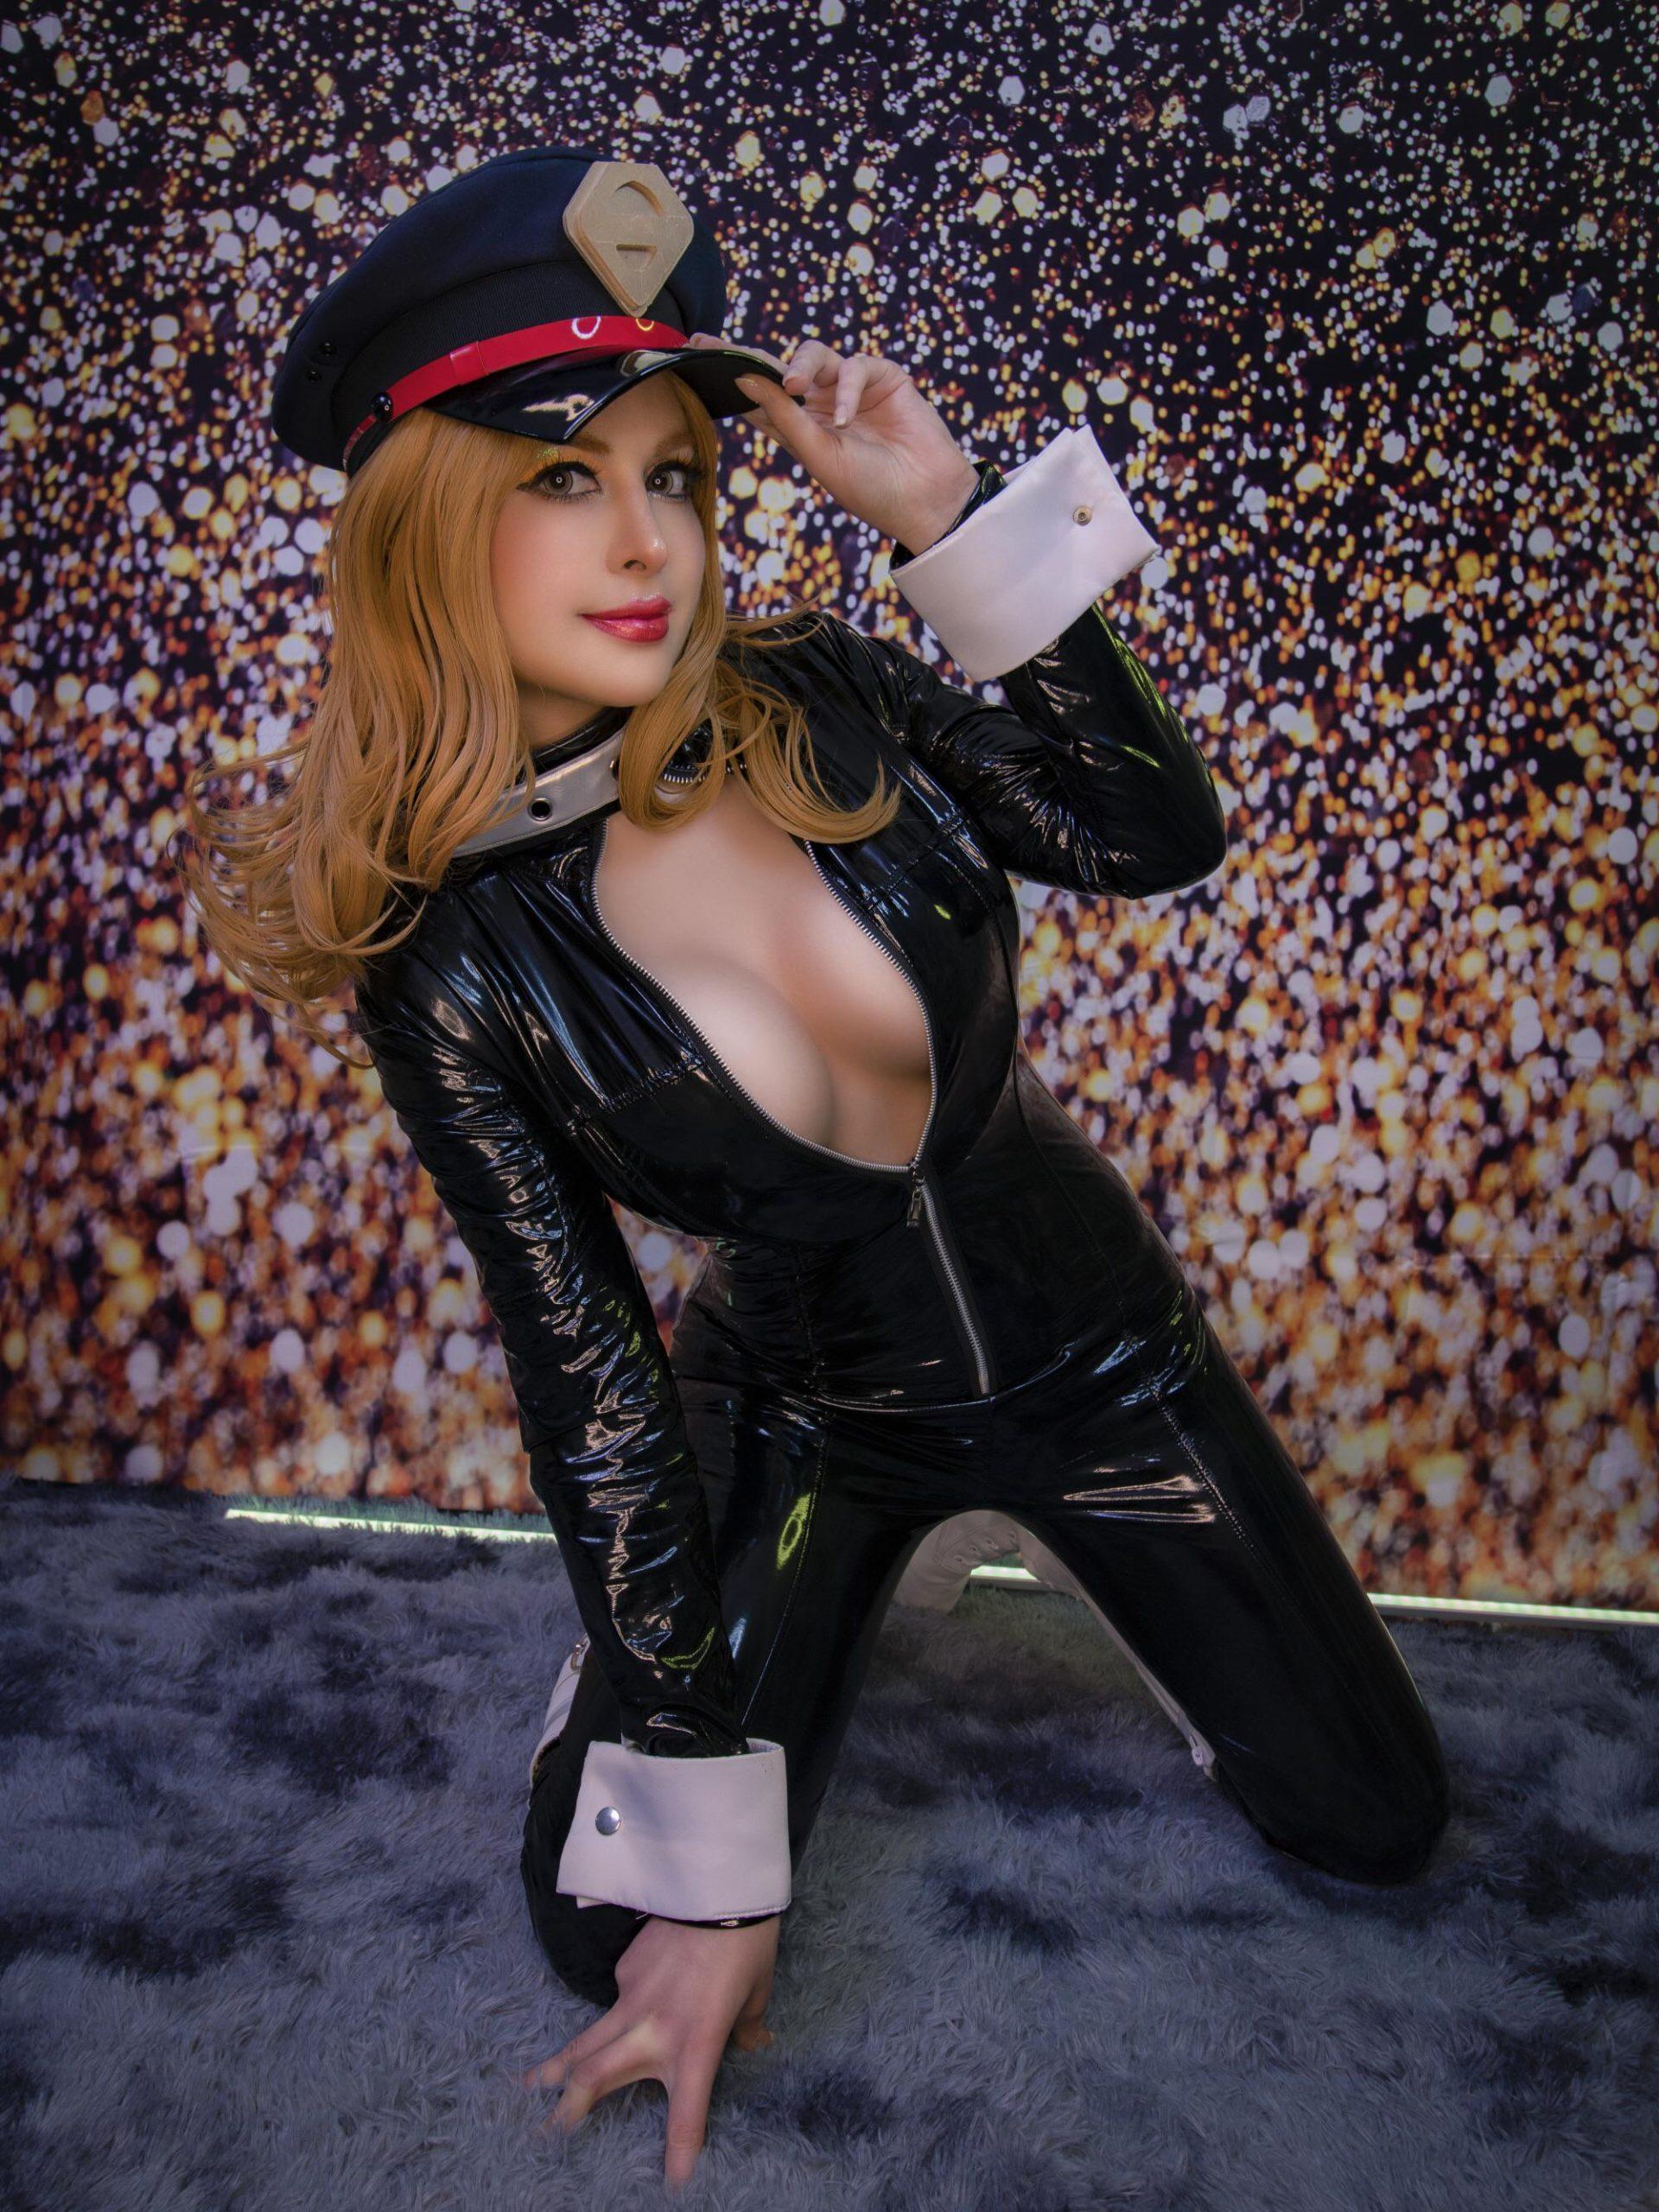 Camie From My Hero Academia Cosplay By CarmenPilarBest